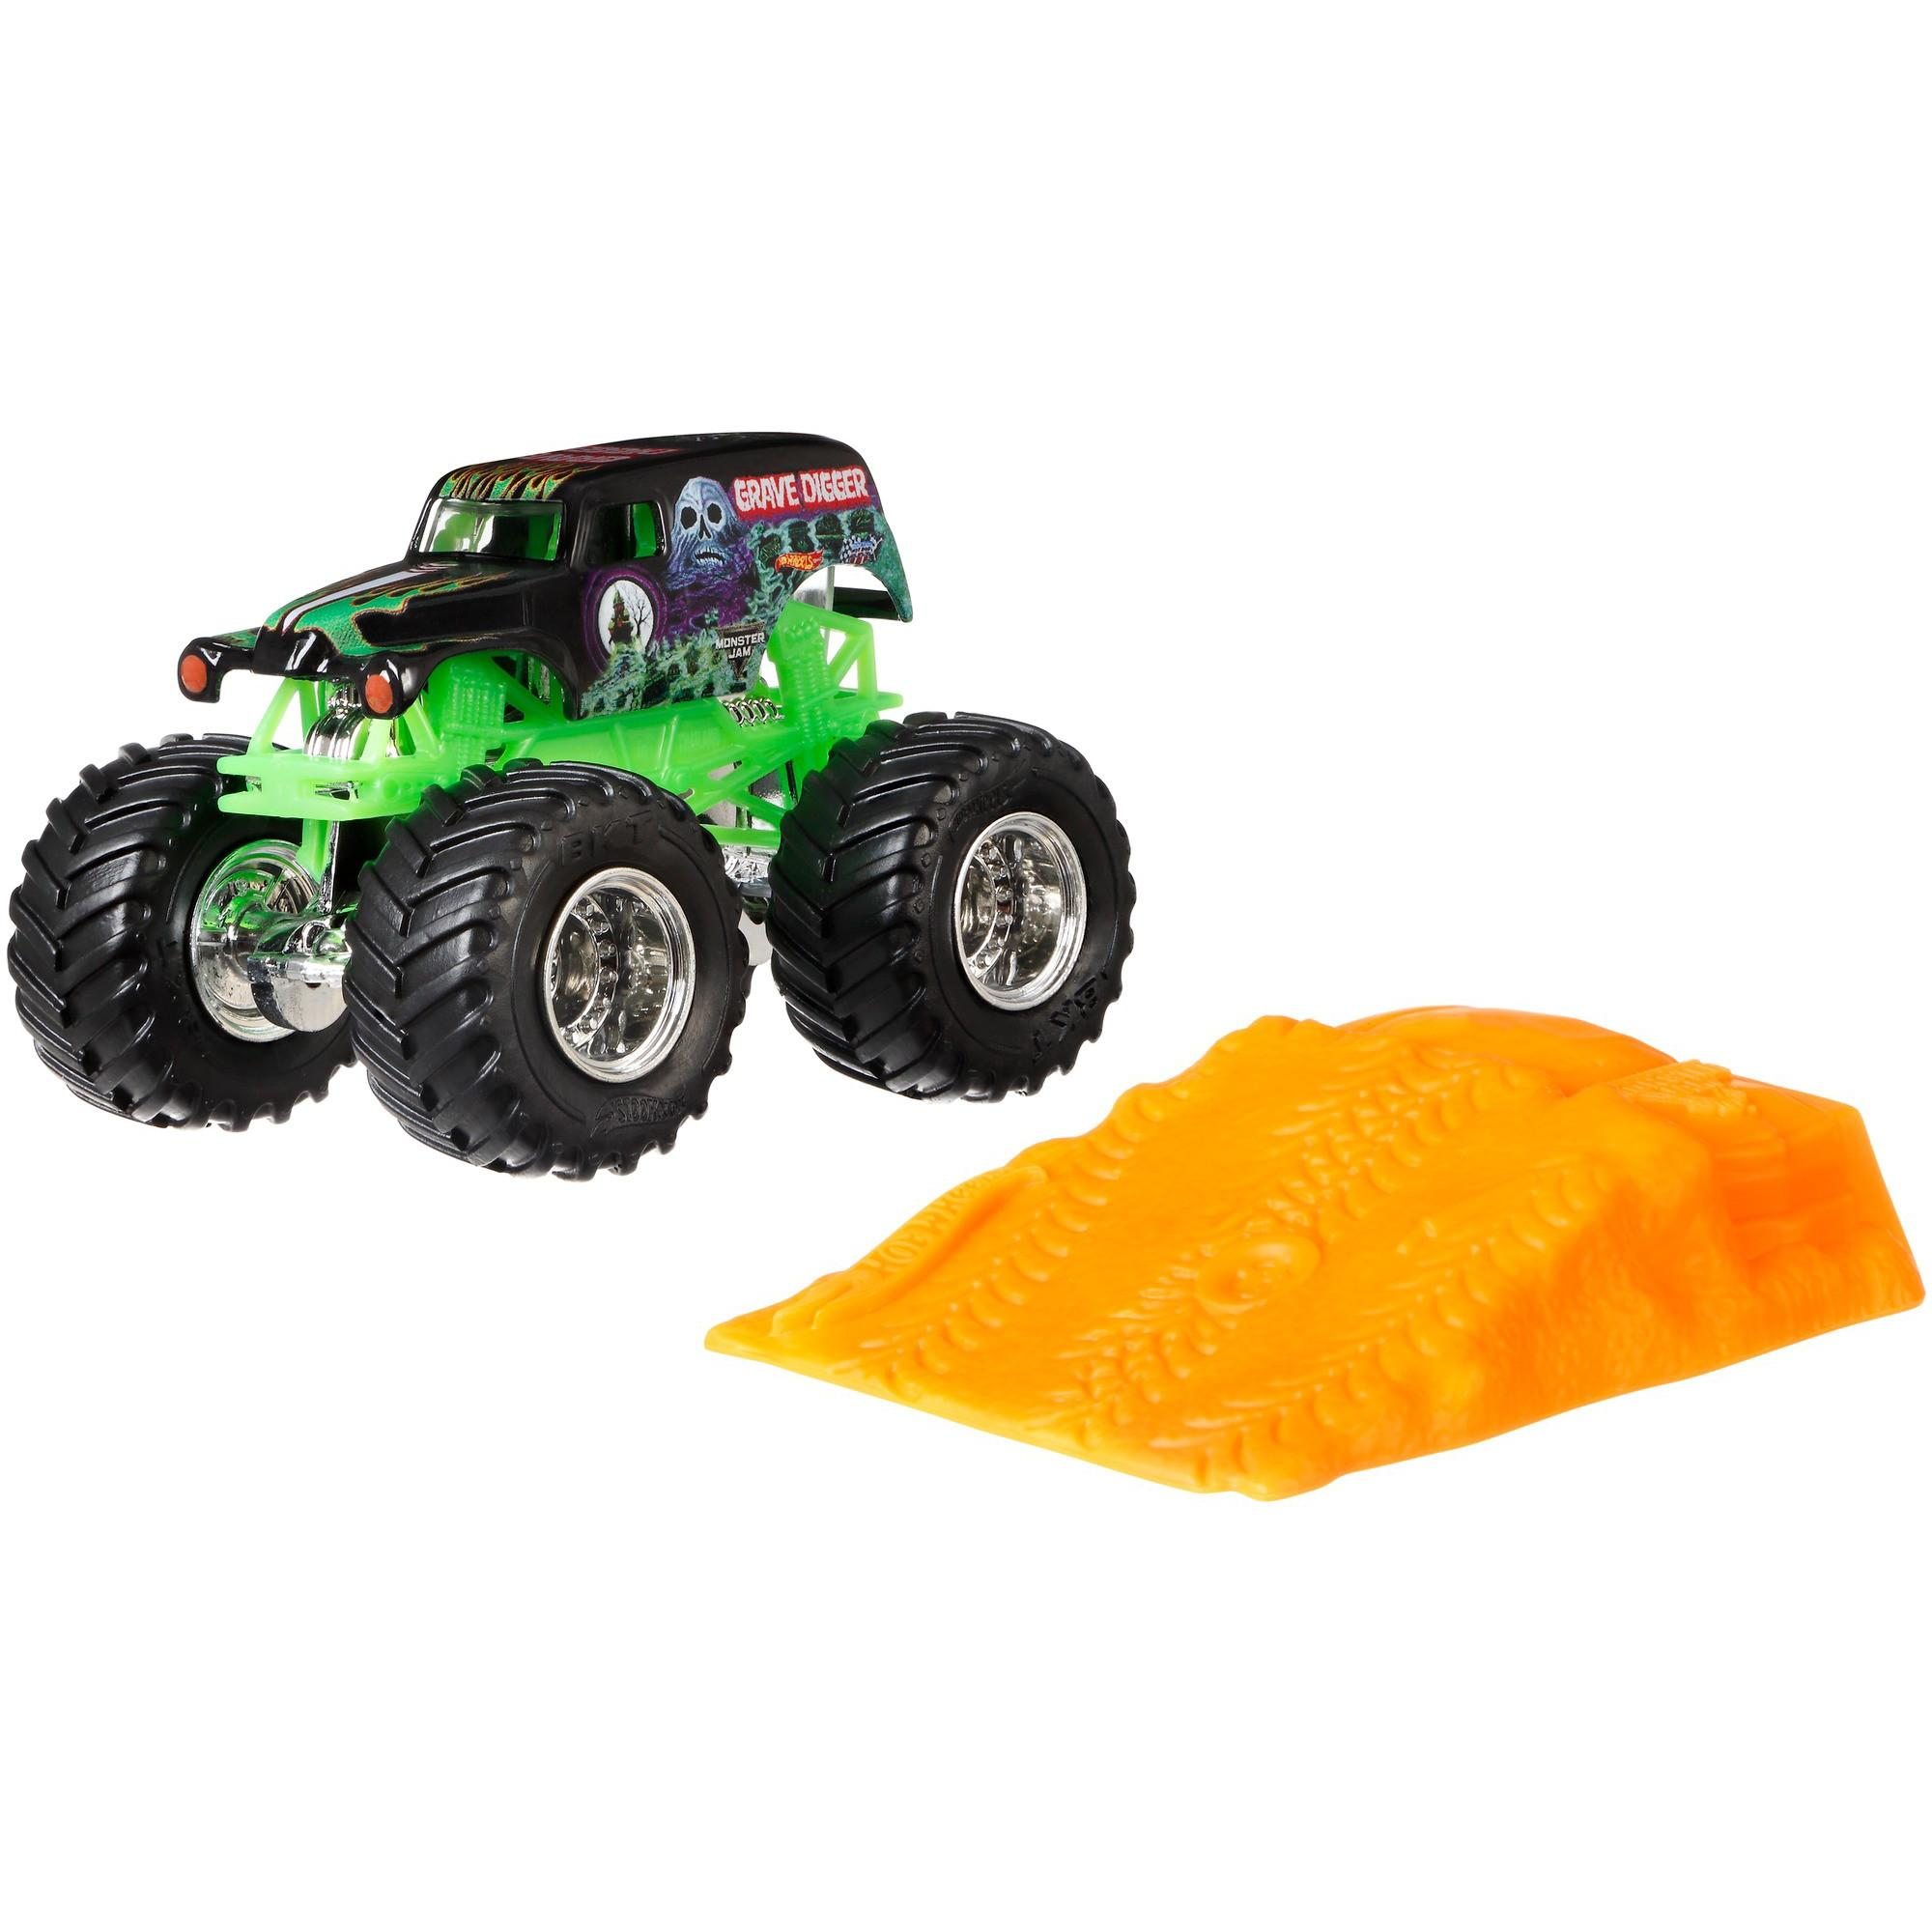 Hot Wheels Monster Jam Grave Digger Vehicle by Mattel